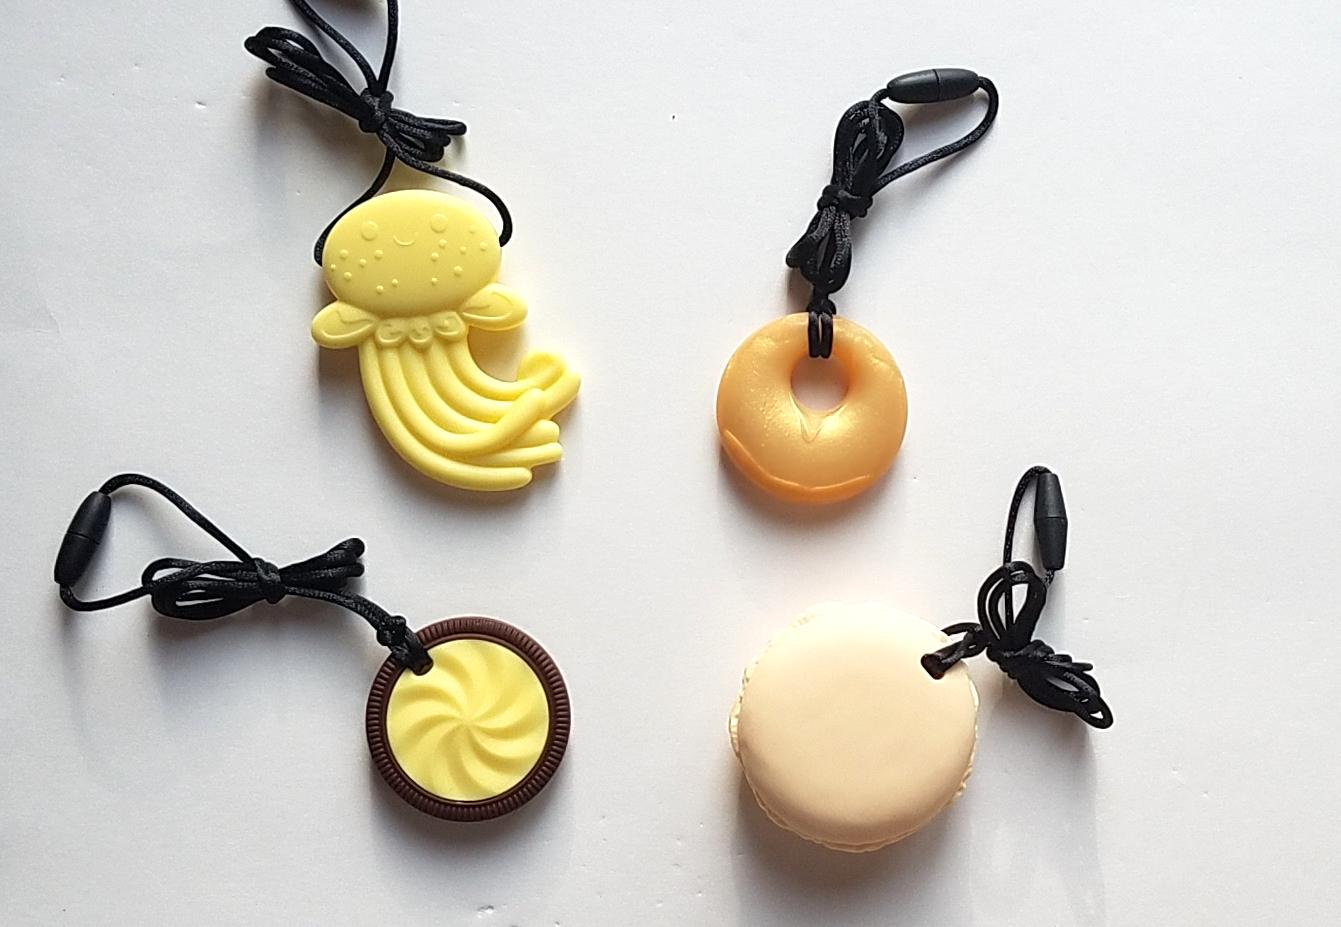 Clockwise from top left: Yellow jellyfish, gold annular, yellow macaron, lemon yellow cookie.